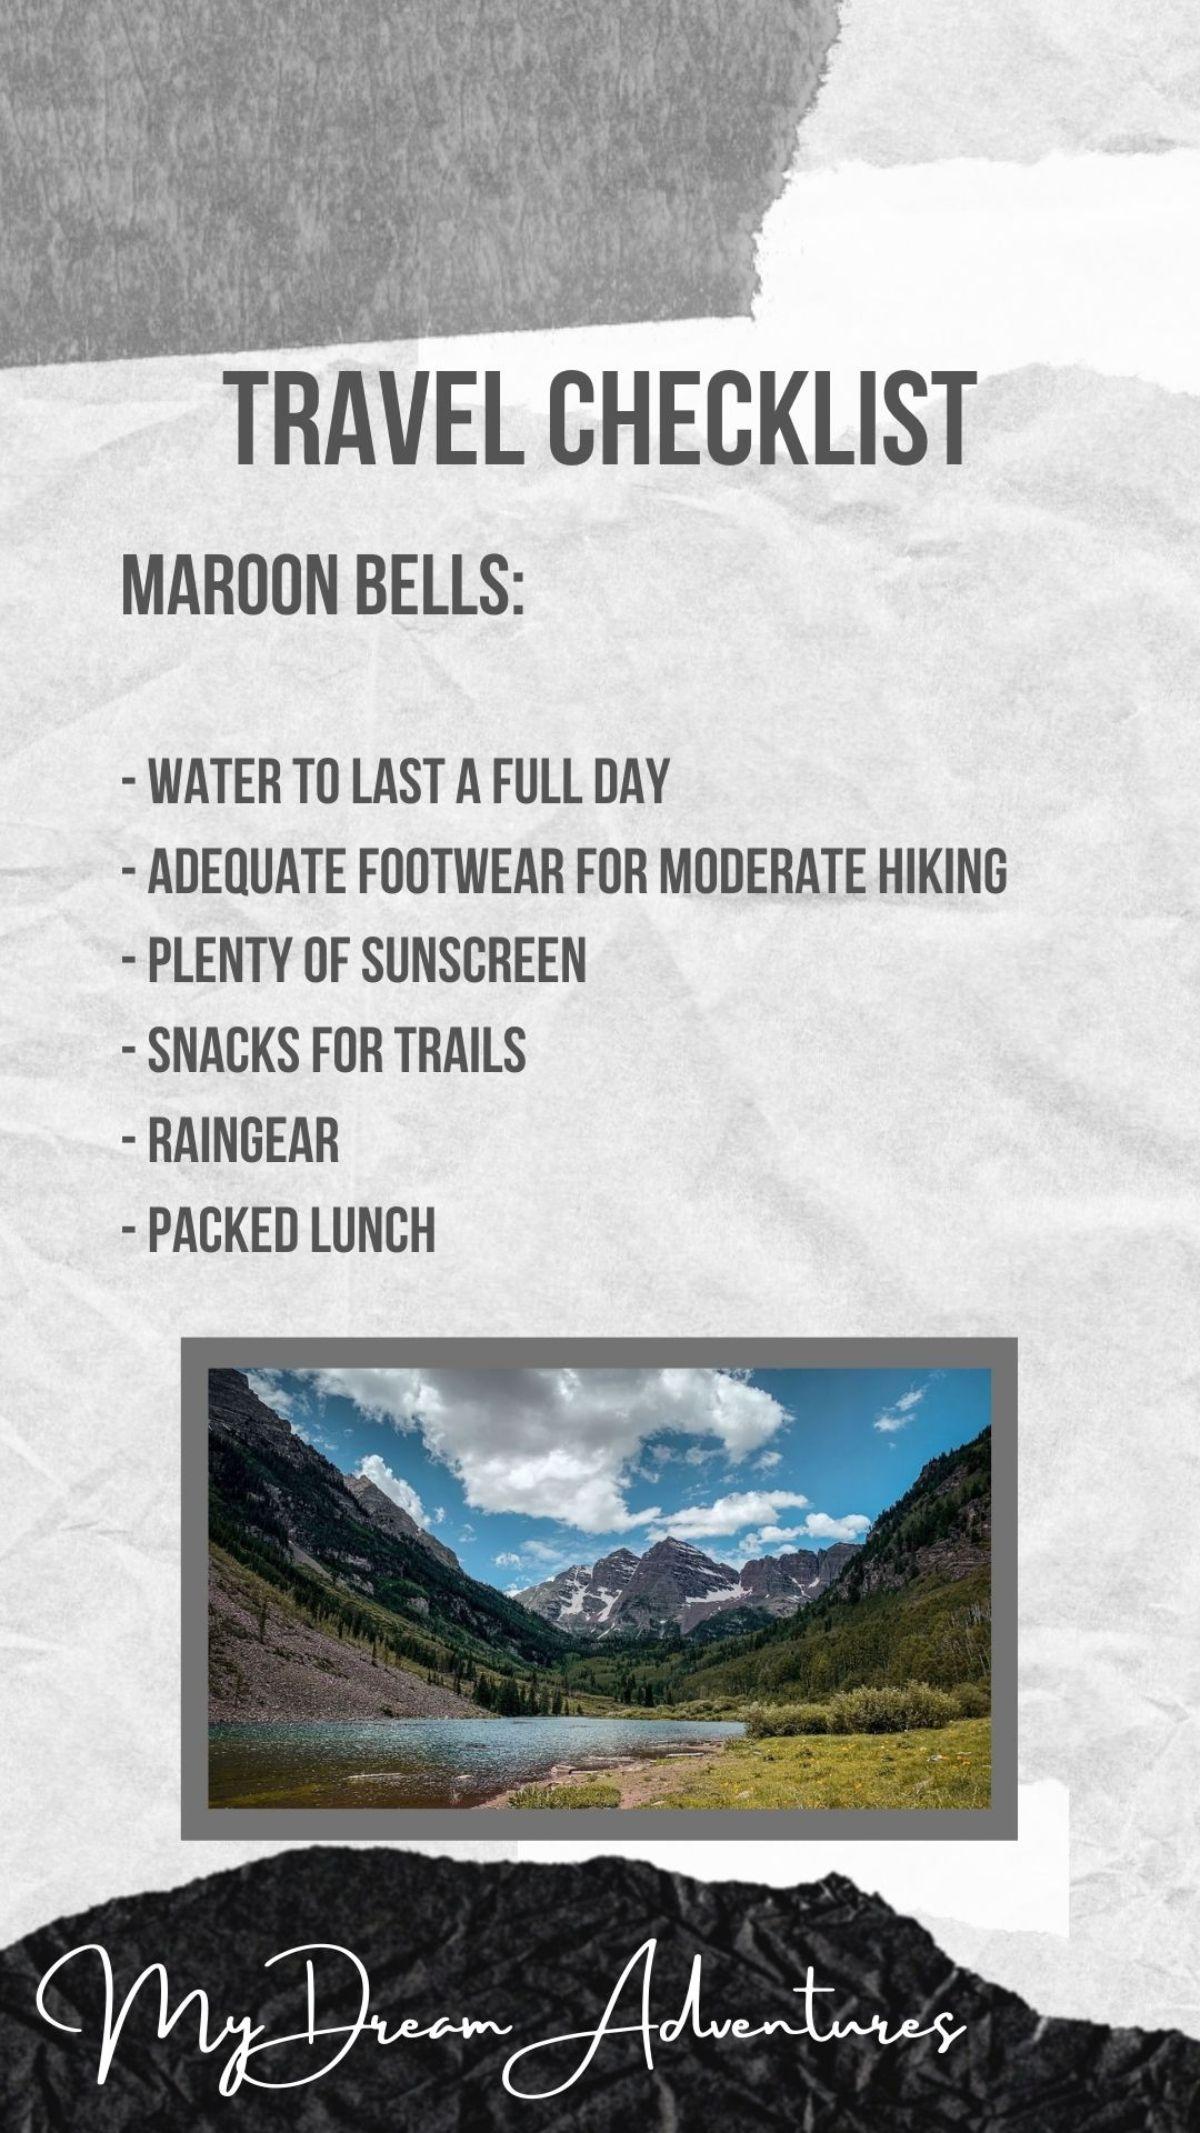 Maroon Bells Travel Checklist